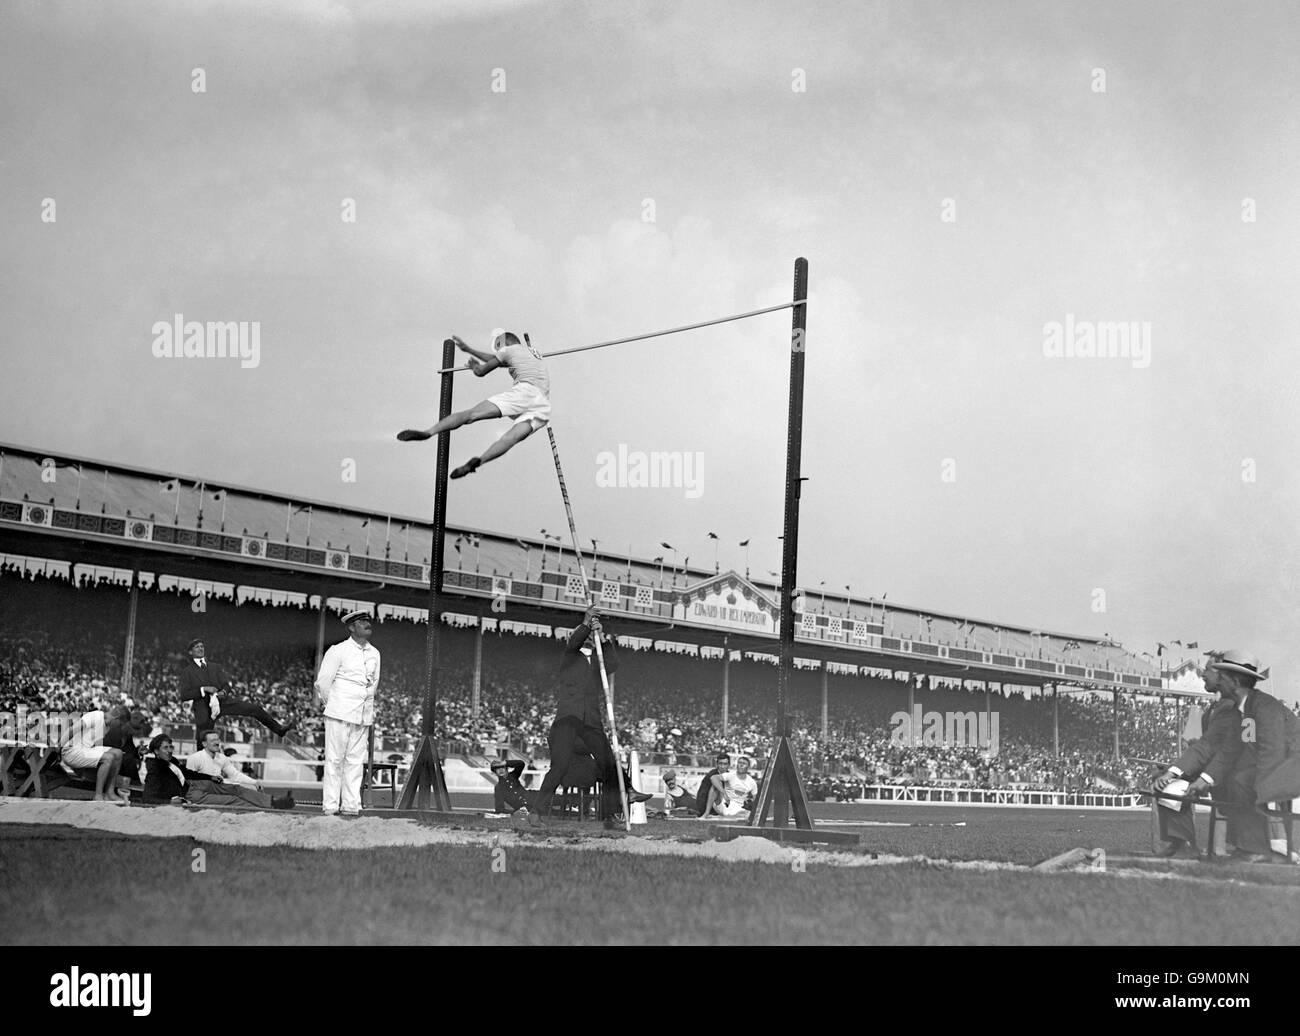 Athletics - London Olympic Games 1908 - Pole Vault - Final - White City - Stock Image